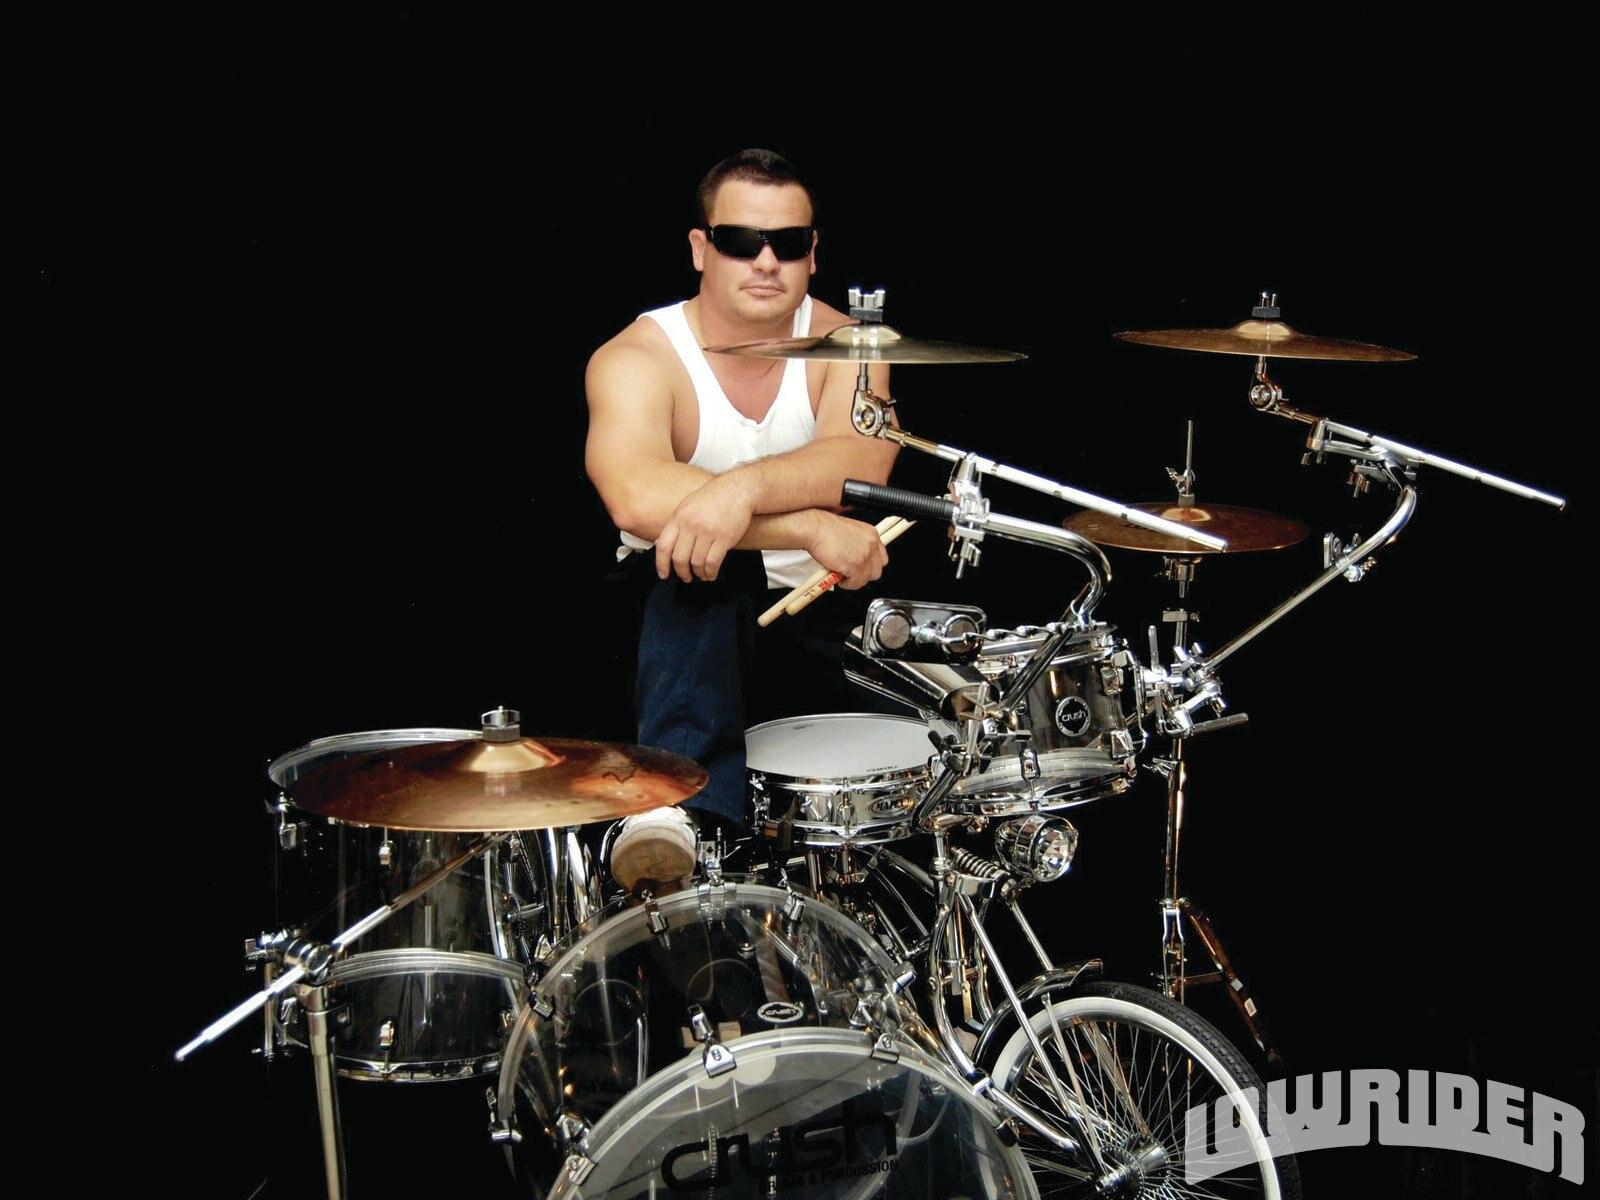 custom-tricycle-drum-kit-austin-comnick1